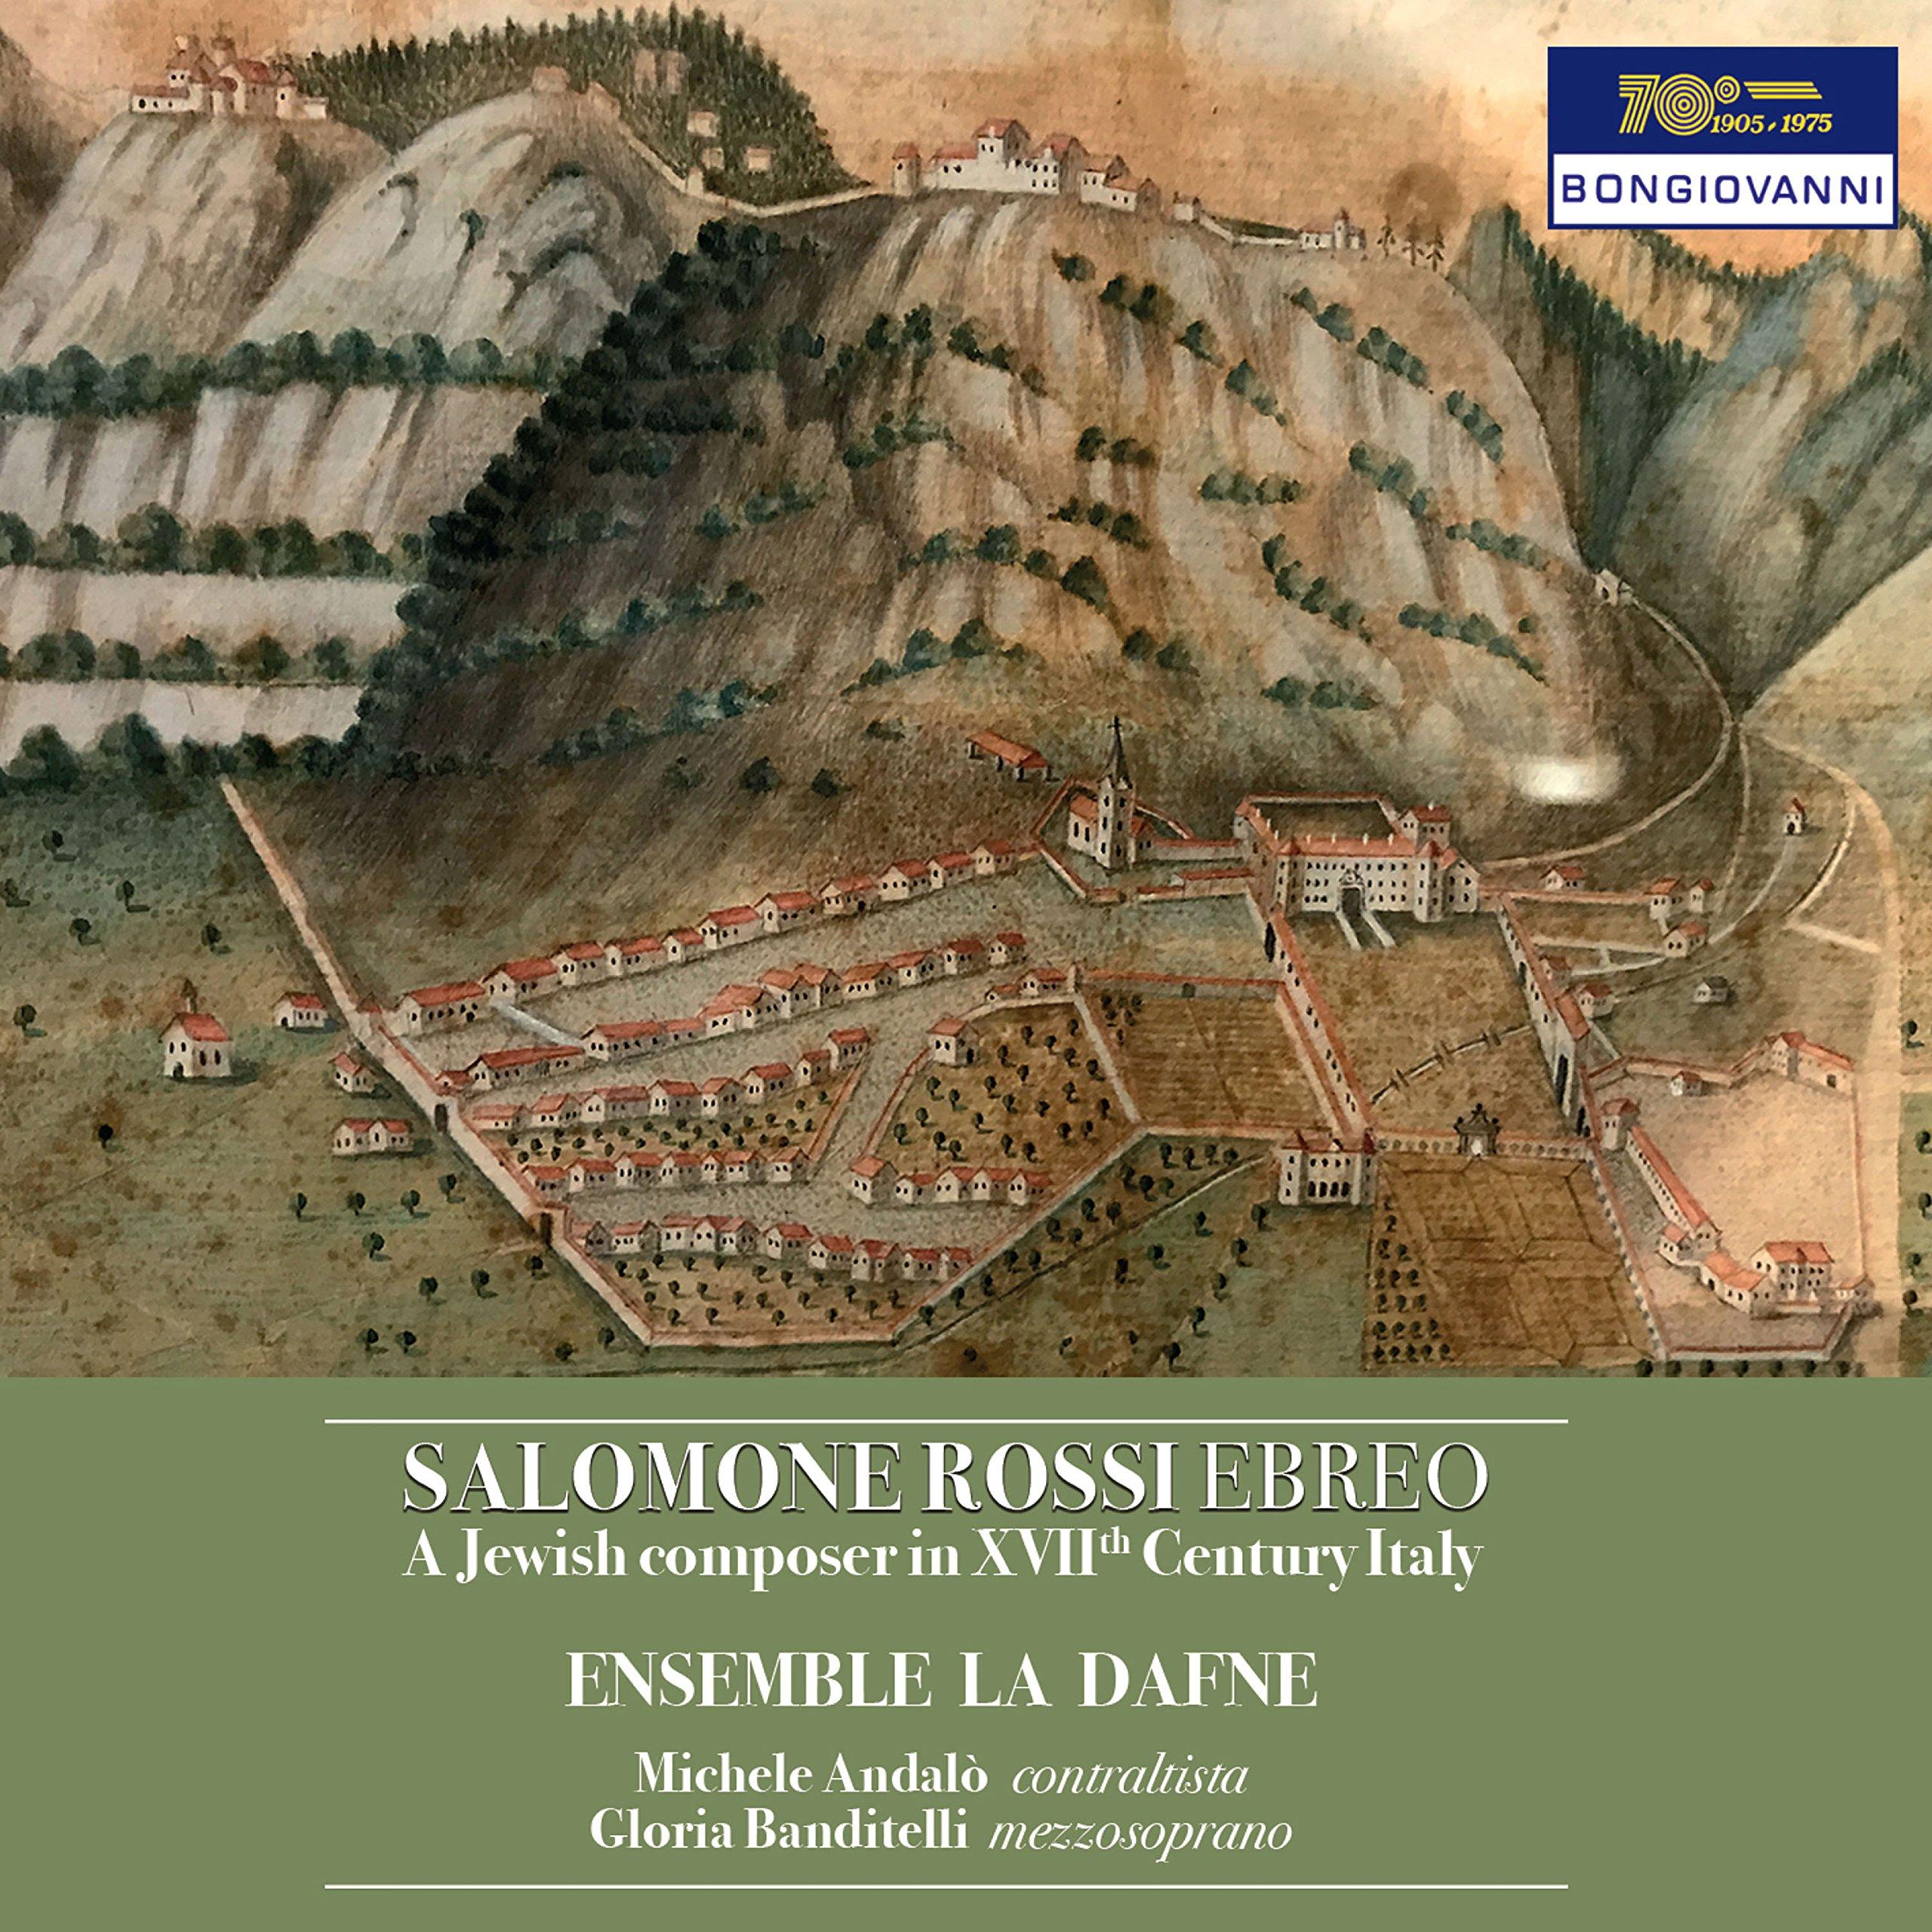 CD : MICHELE ANDALO - SARAH MORANDINI, RAMONA HAFELE LUCIA SCHWARZ - GLORIA BANDITELLI - STEFANO ROSSI - ENSEMBLE LA DAFNE - Jewish Composer In 16th Century Italy (CD)